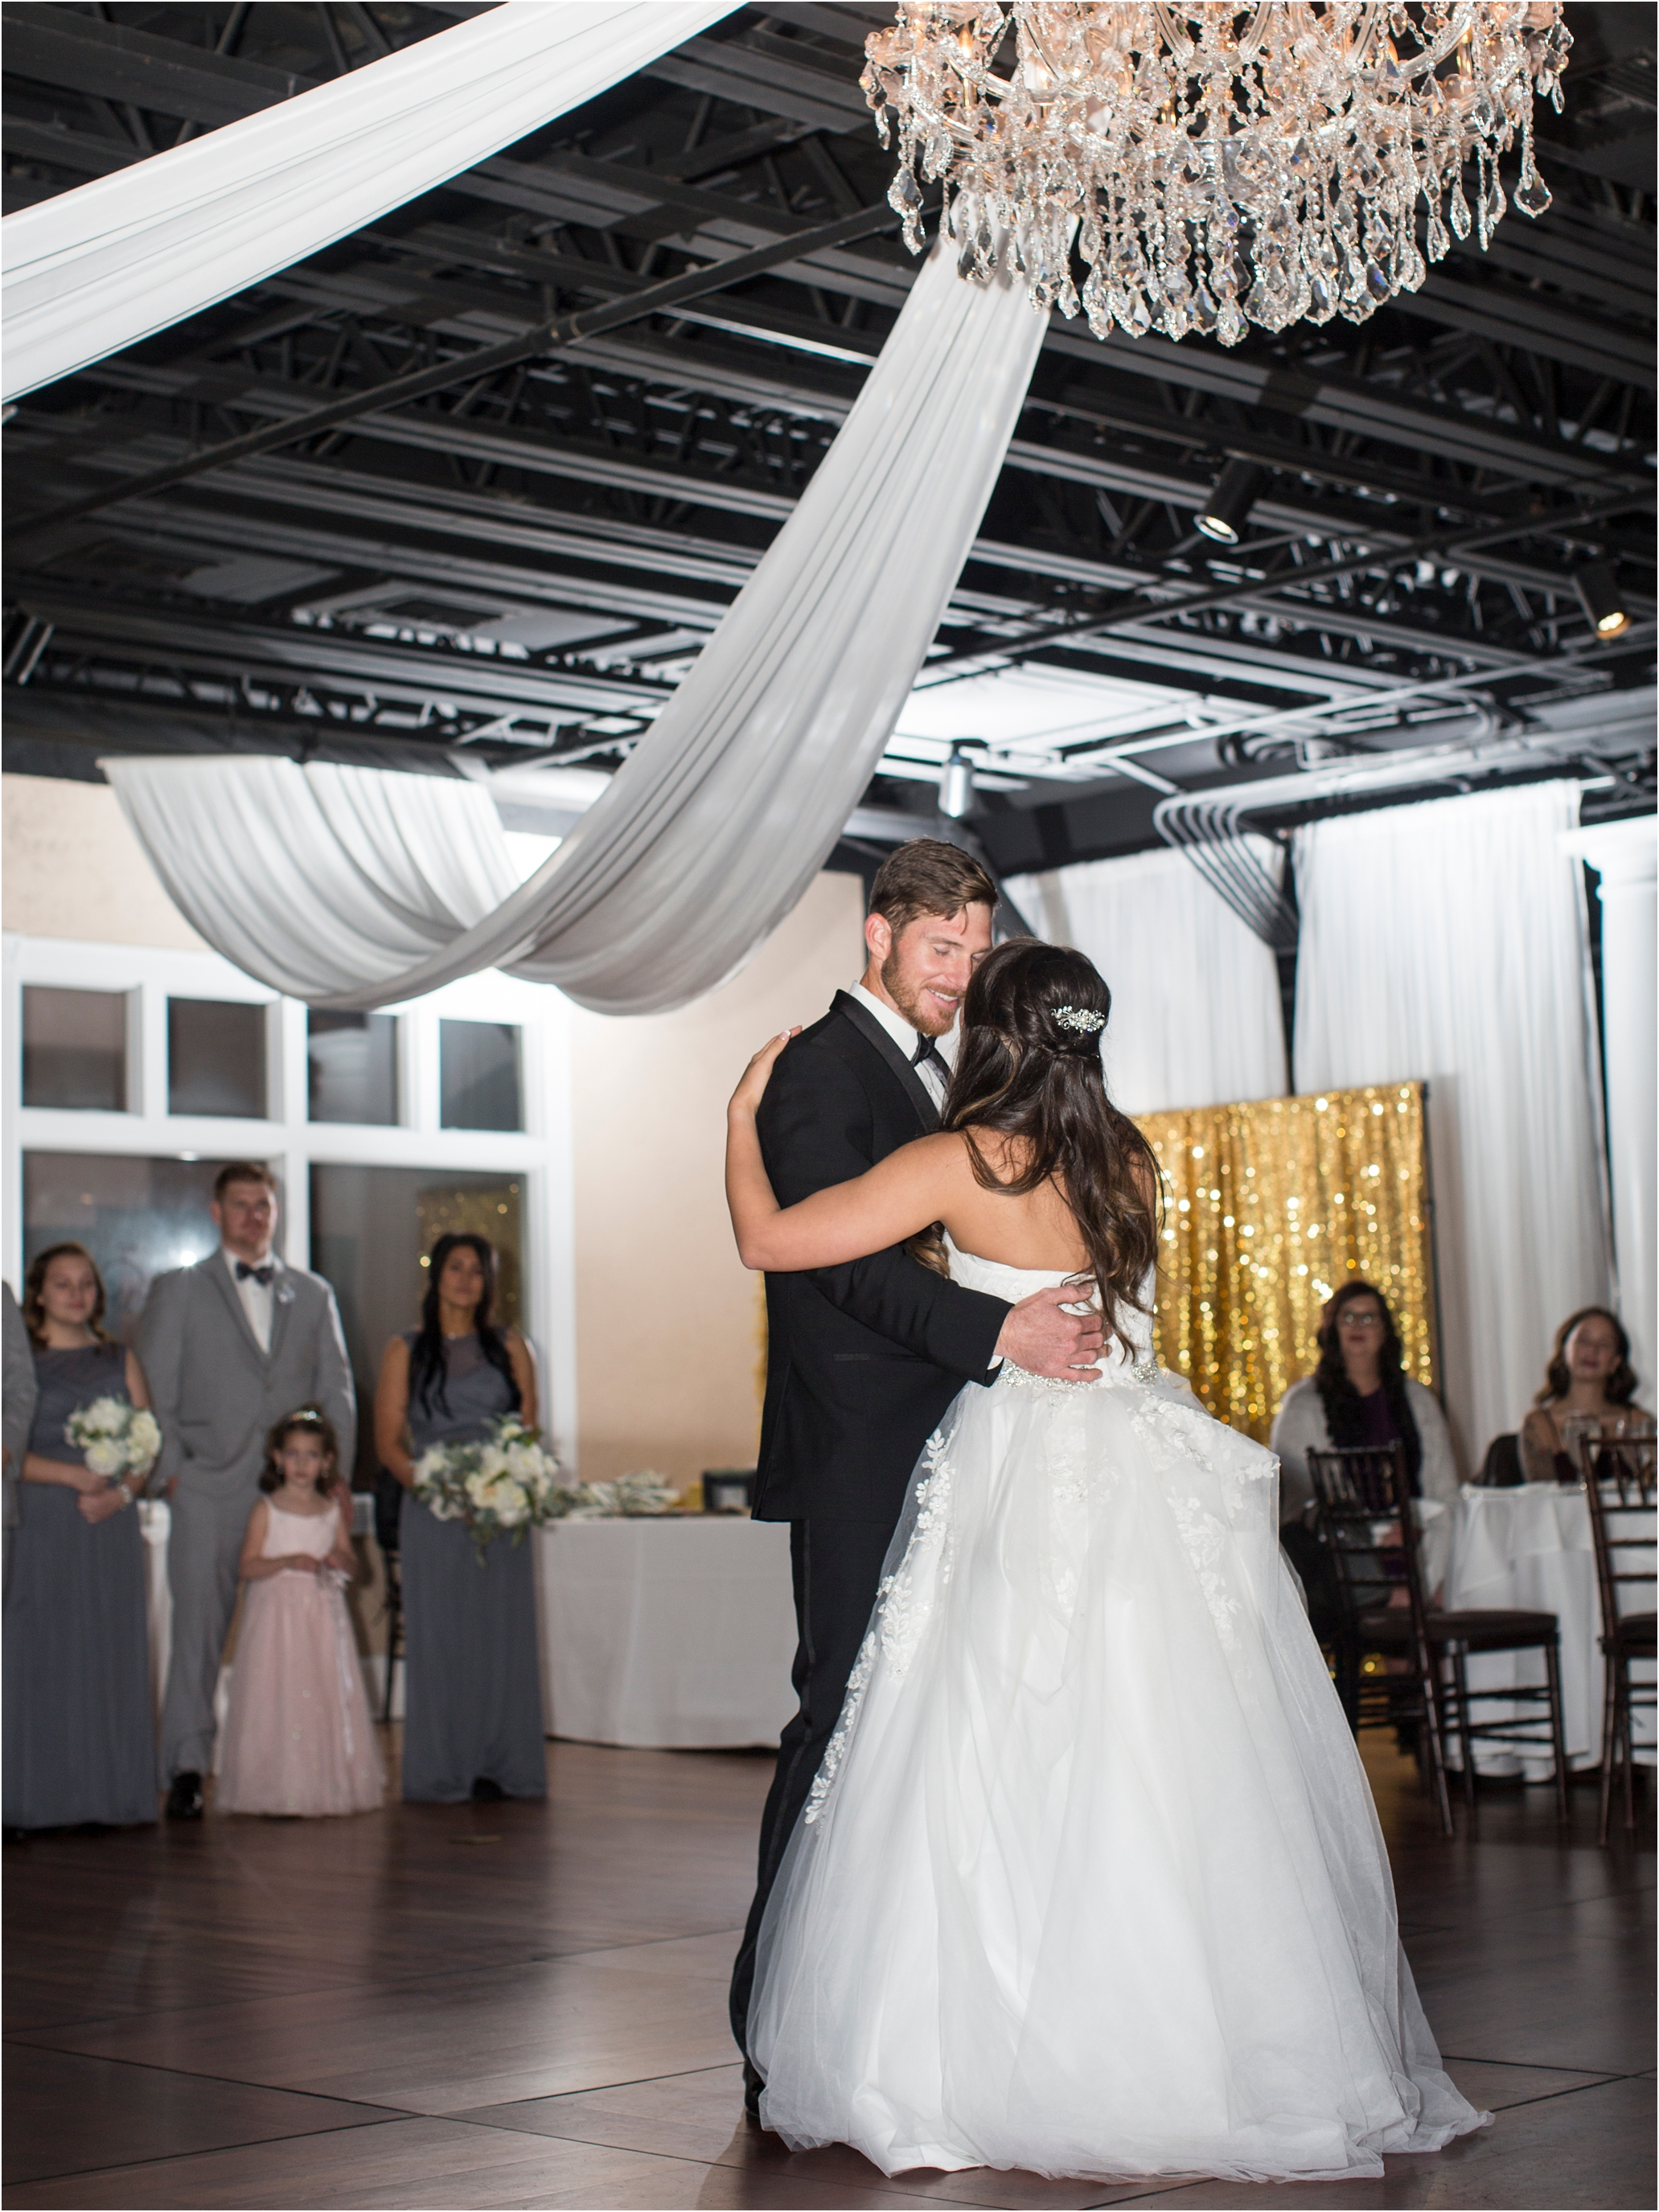 Lisa Silva Photography- Ponte Vedra Beach and Jacksonville, Florida Fine Art Film Wedding Photography- Wedding at The White Room Villa Blanca in St. Augustine, Florida_0066.jpg